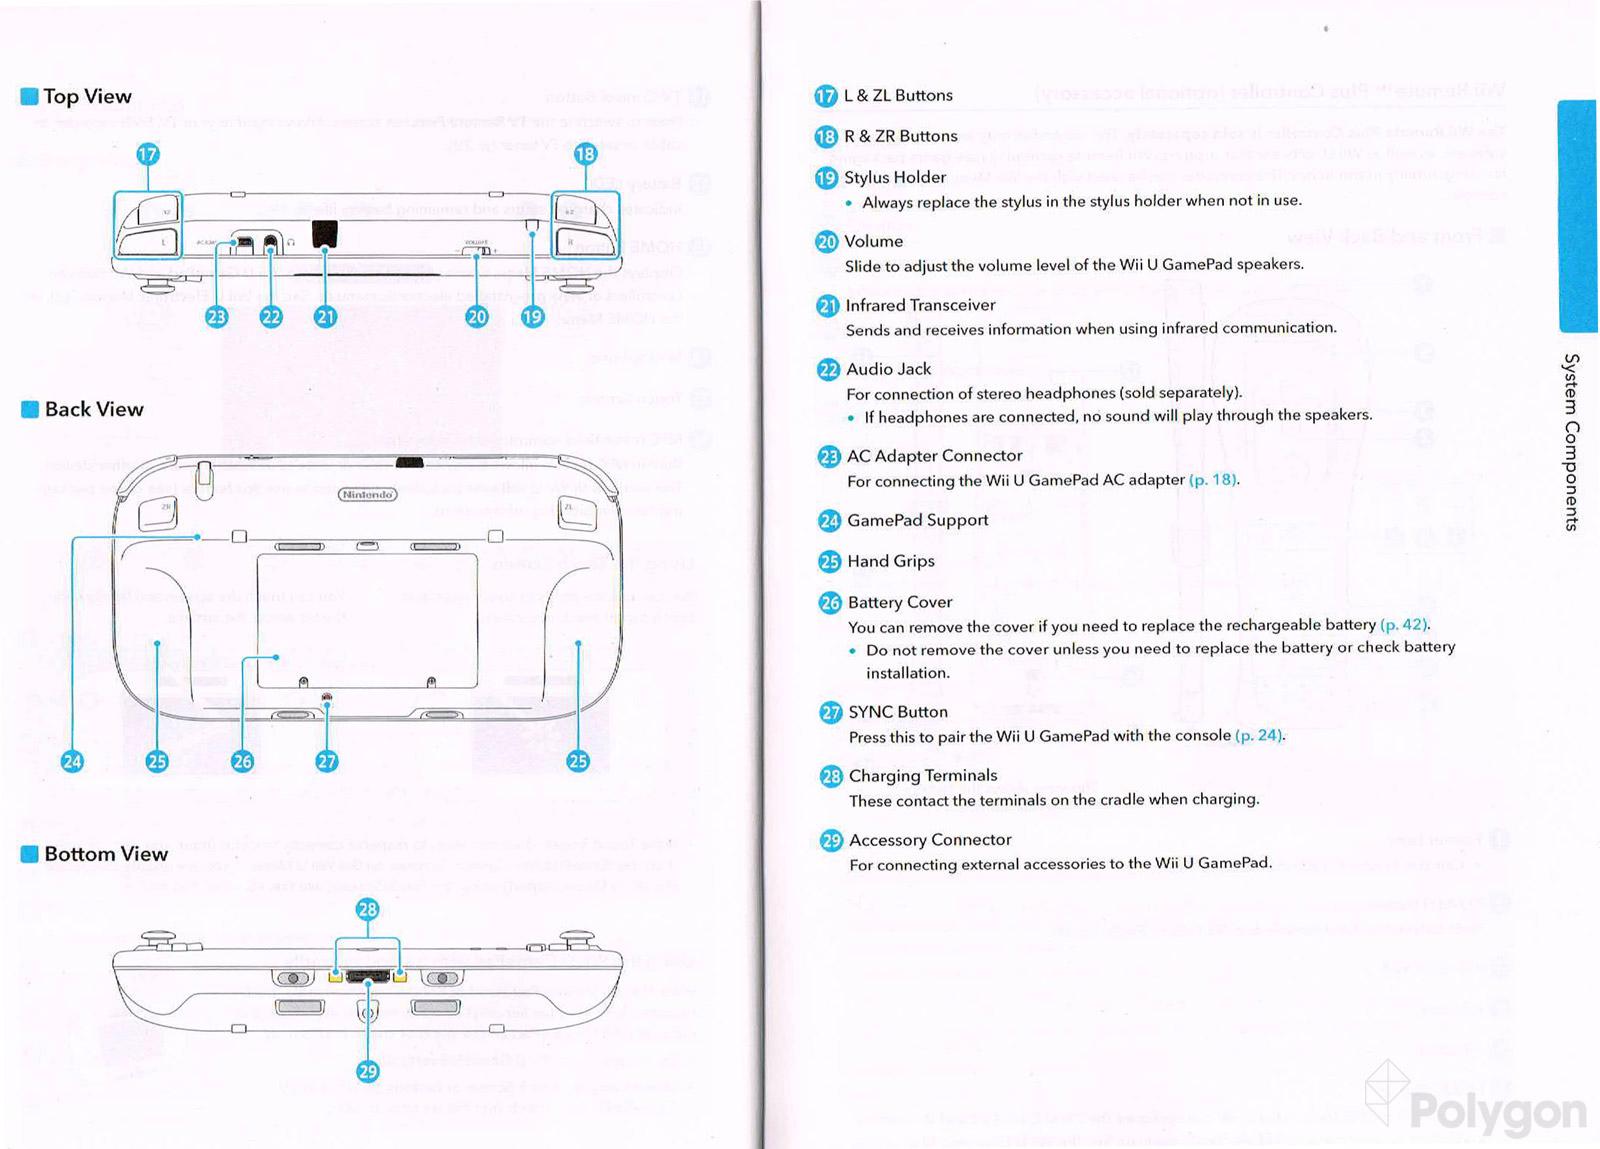 wii u instruction manual photos nintendotoday rh nintendotoday com wii user manual troubleshooting wii user manual troubleshooting